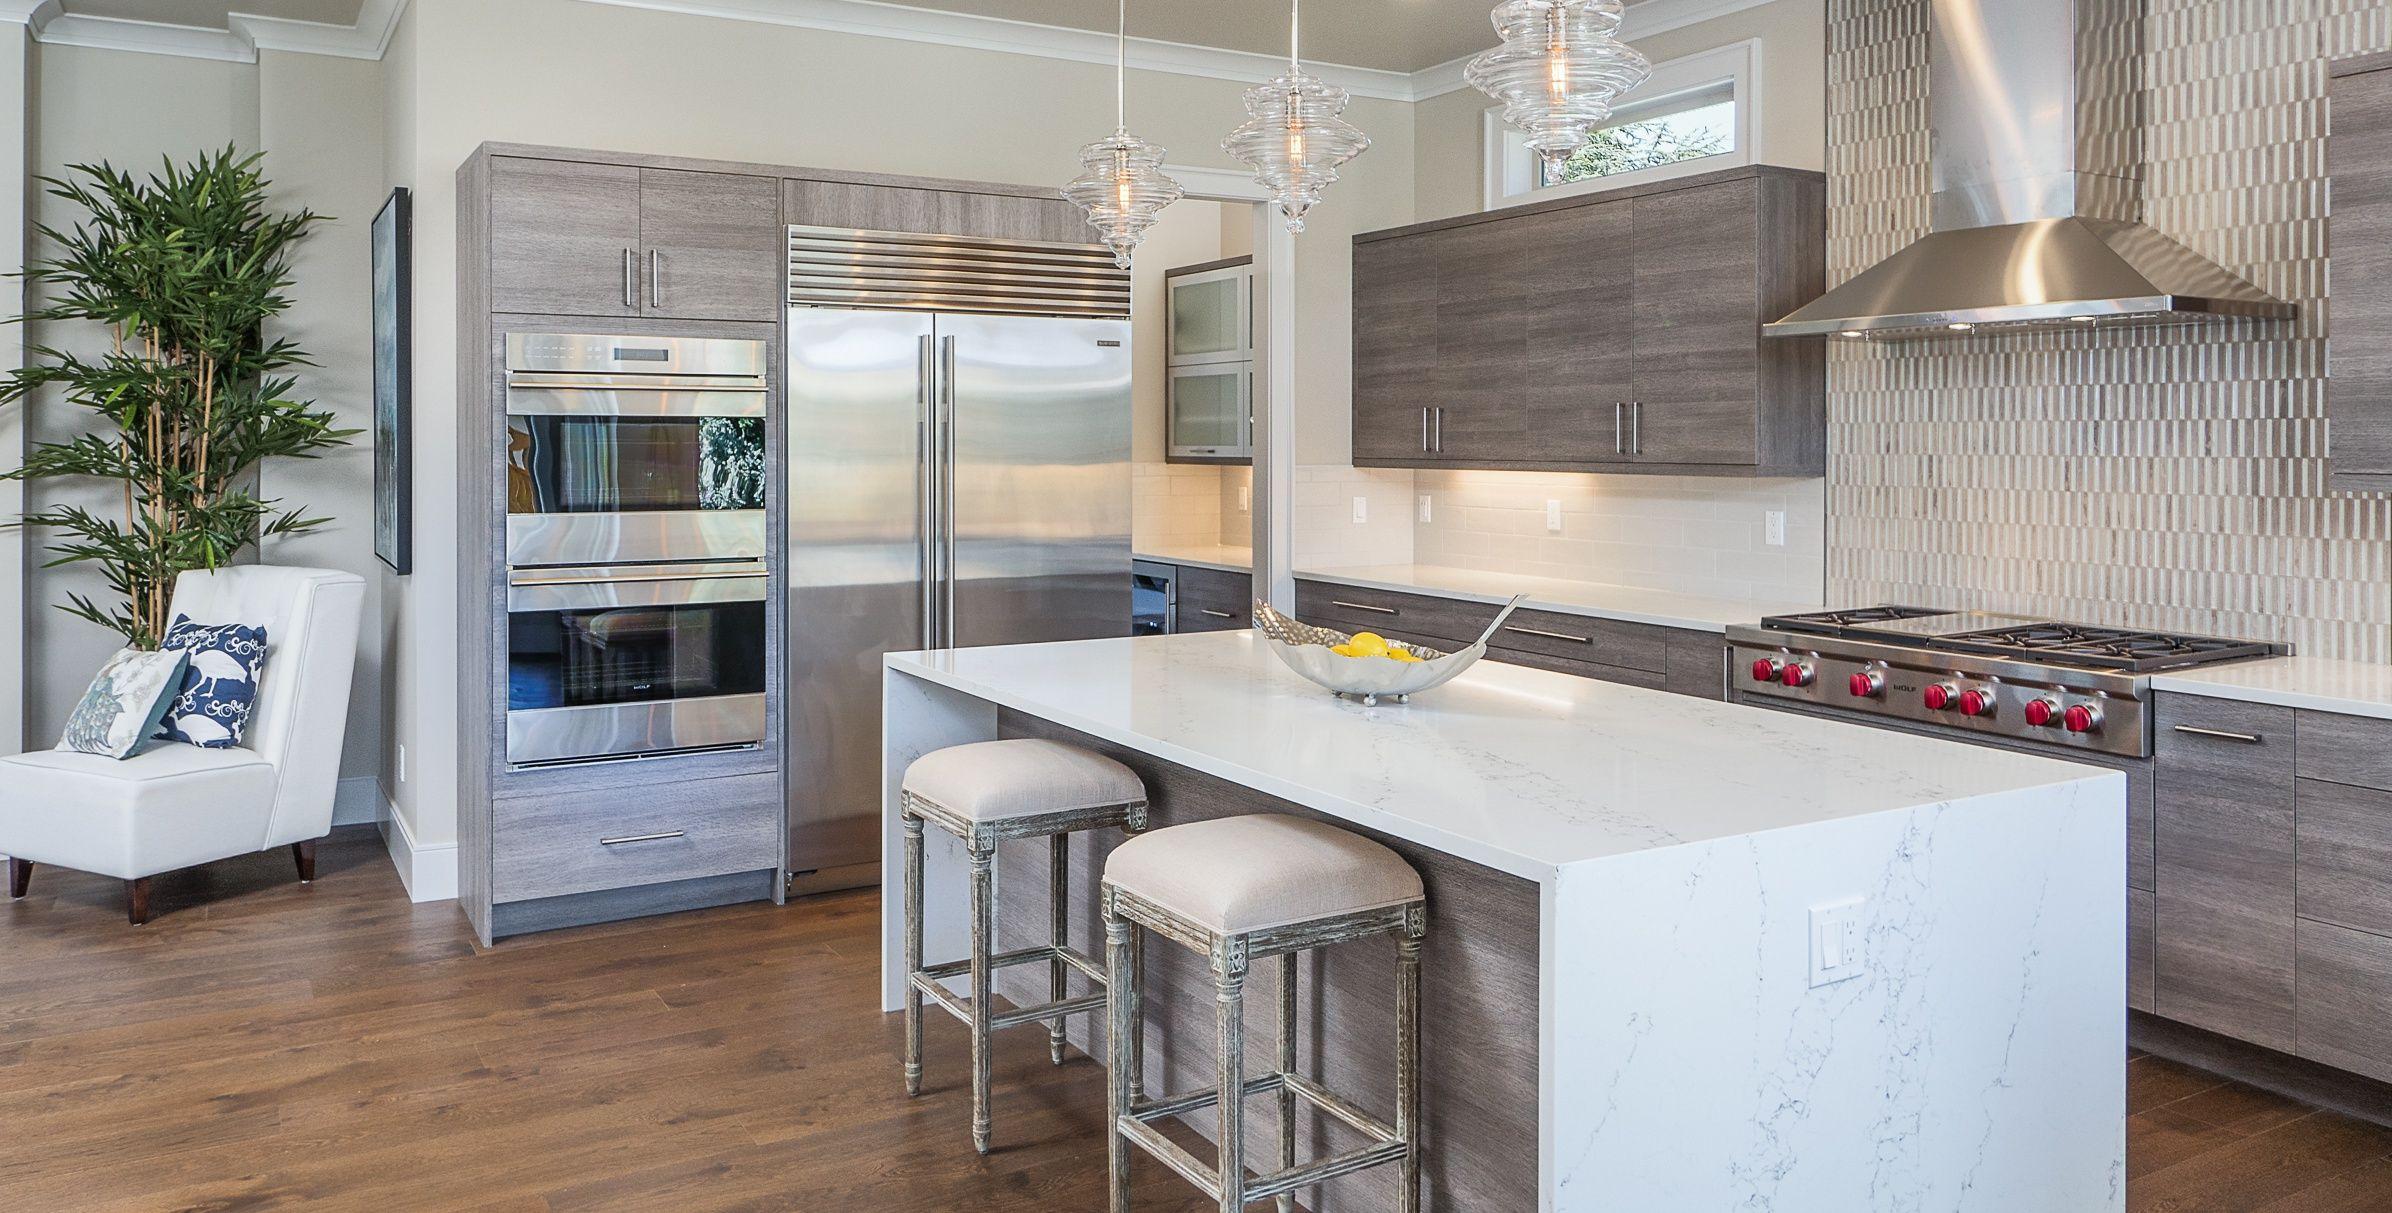 south jersey kitchen remodeling backyard alba cabinets bath design center new vr